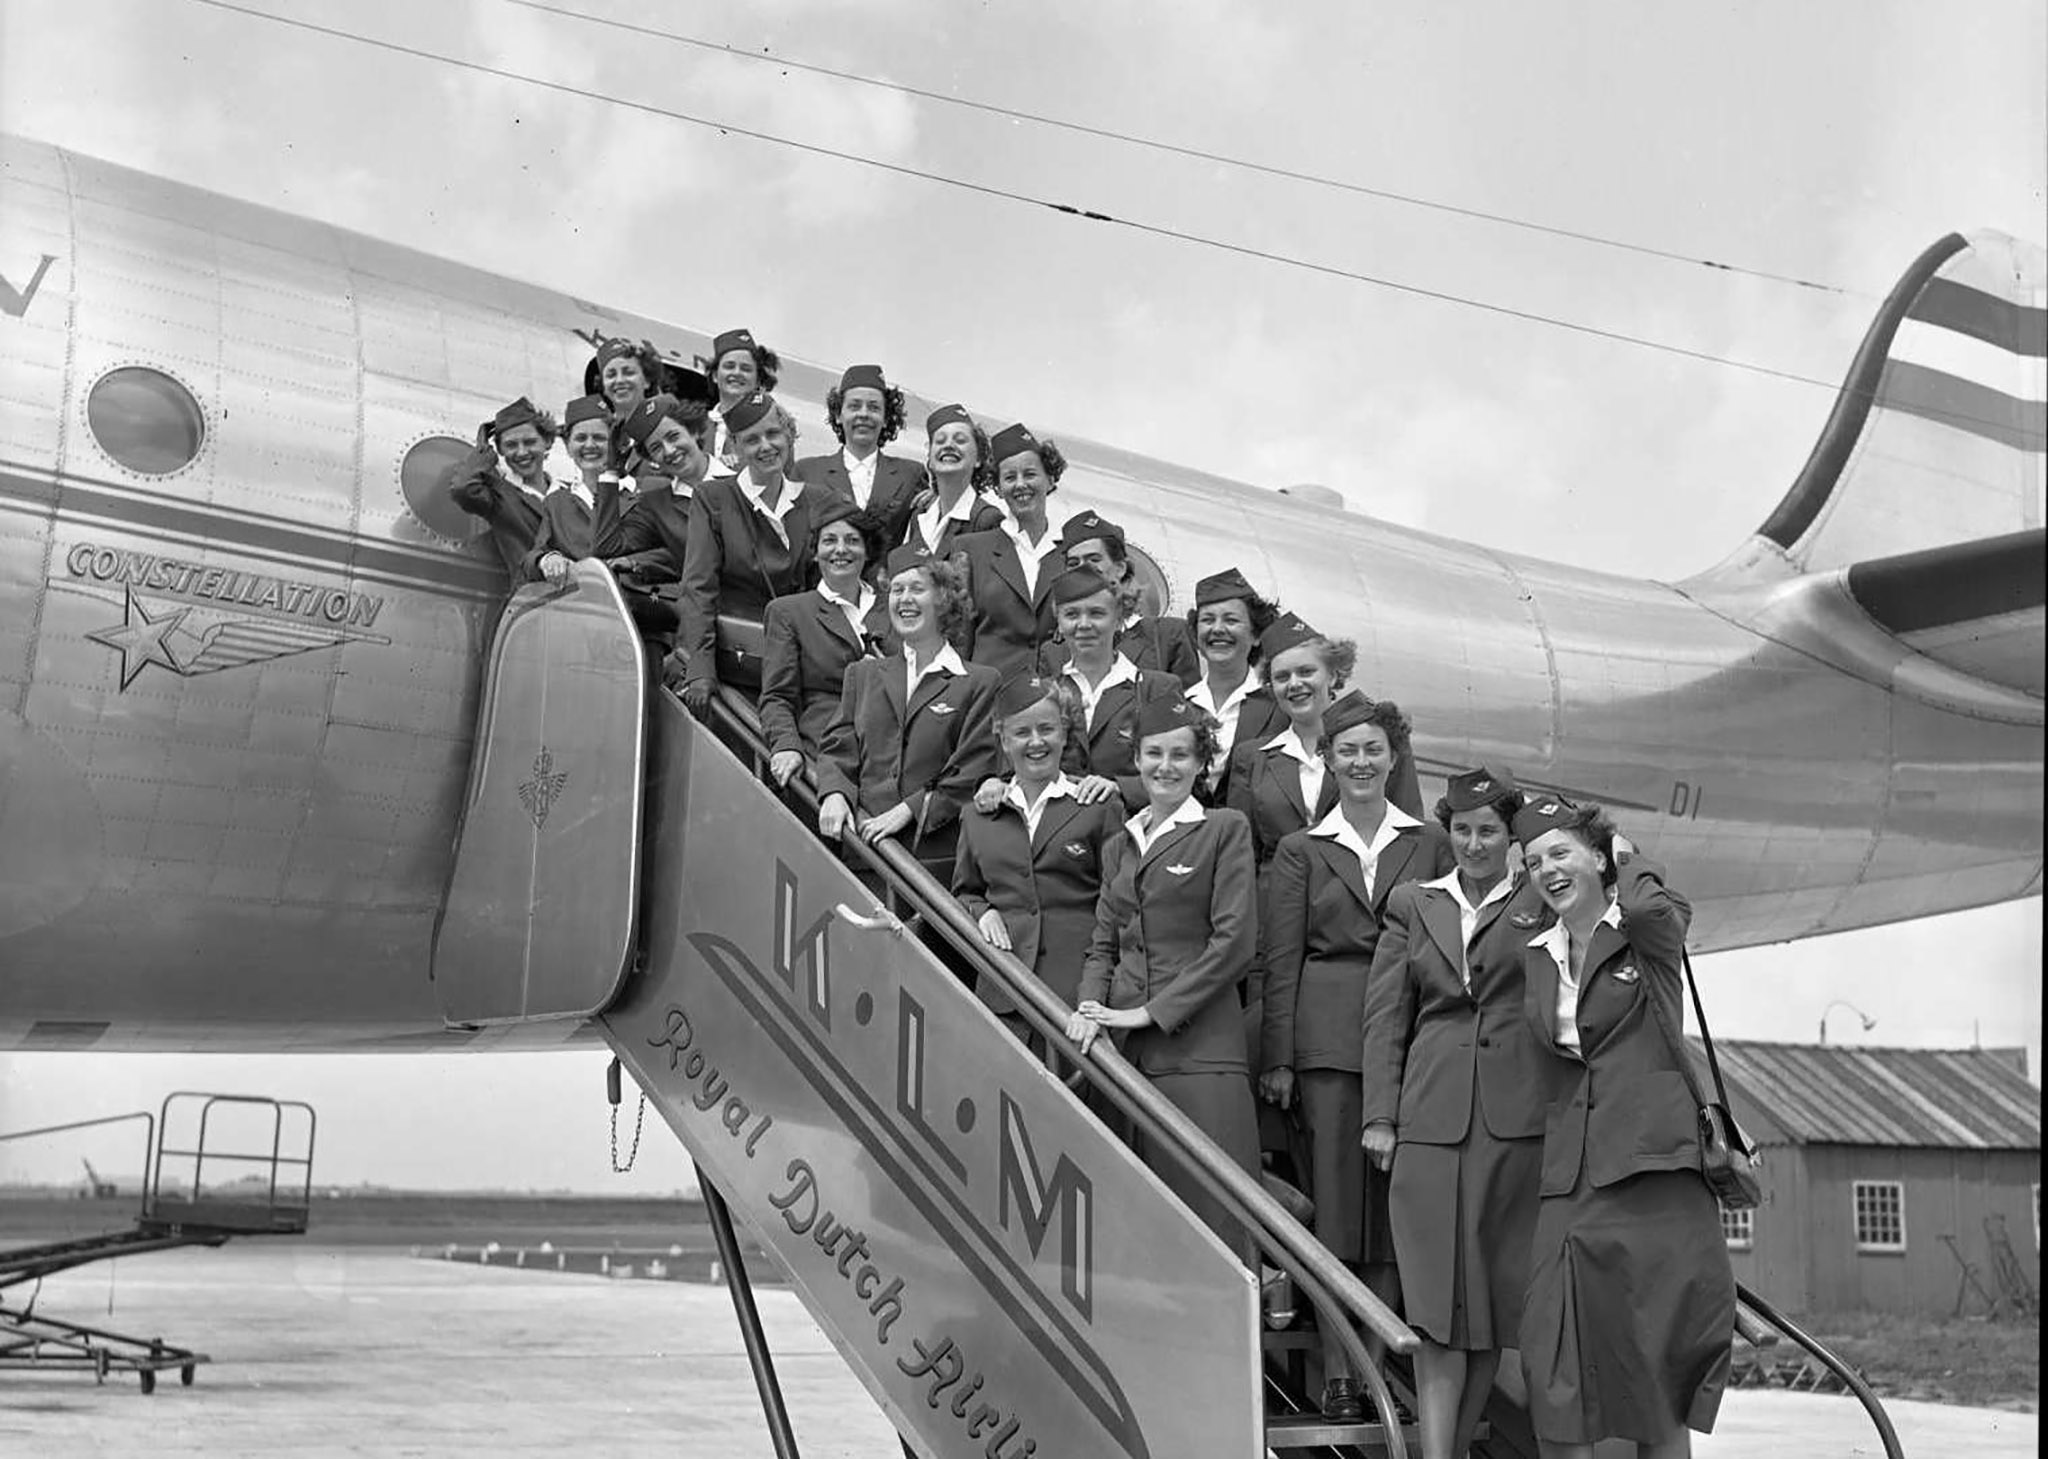 KLM 1950 L-749.jpg